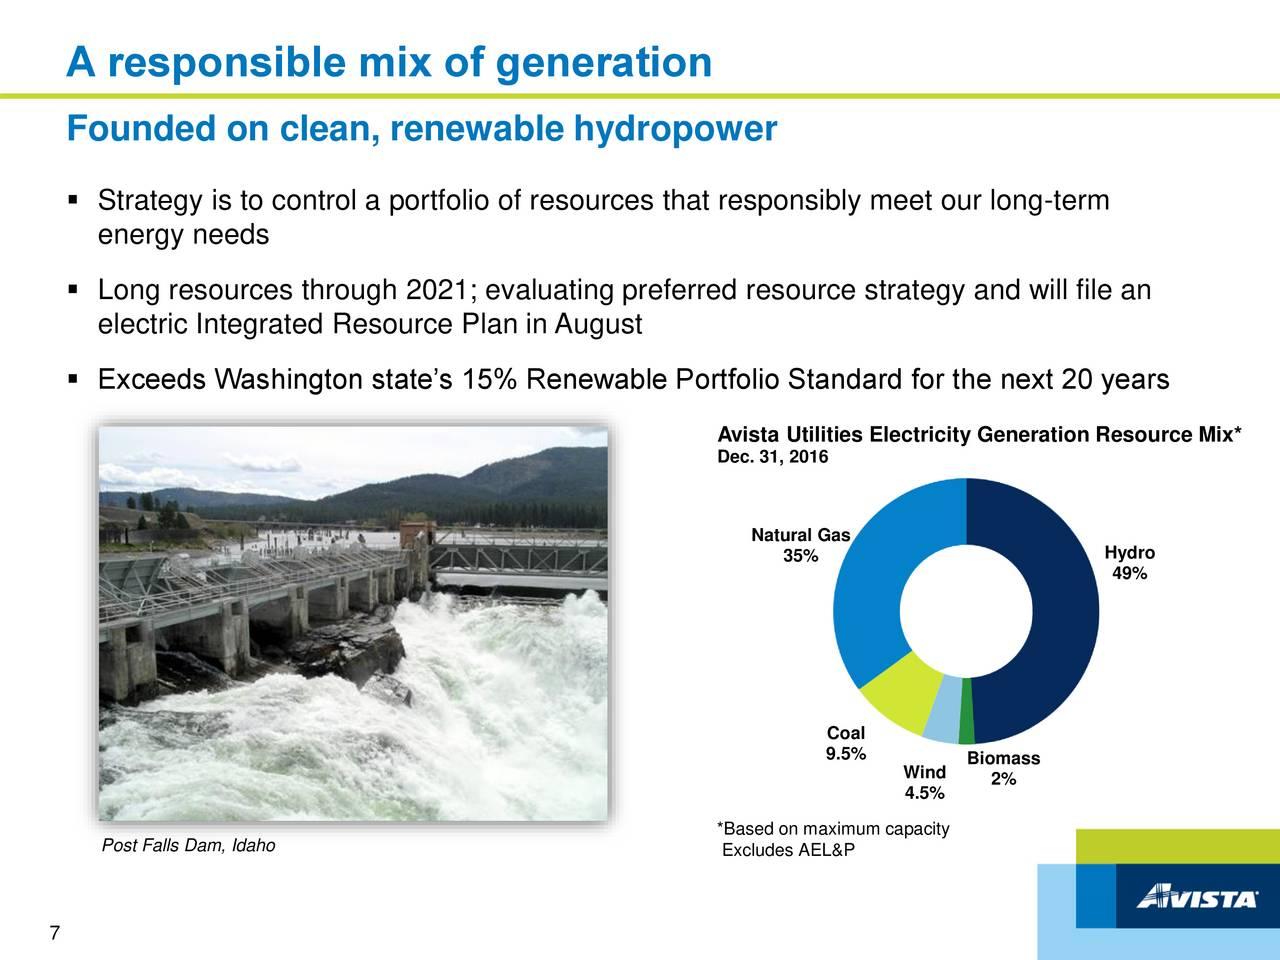 Idaho Natural Resources Corporation